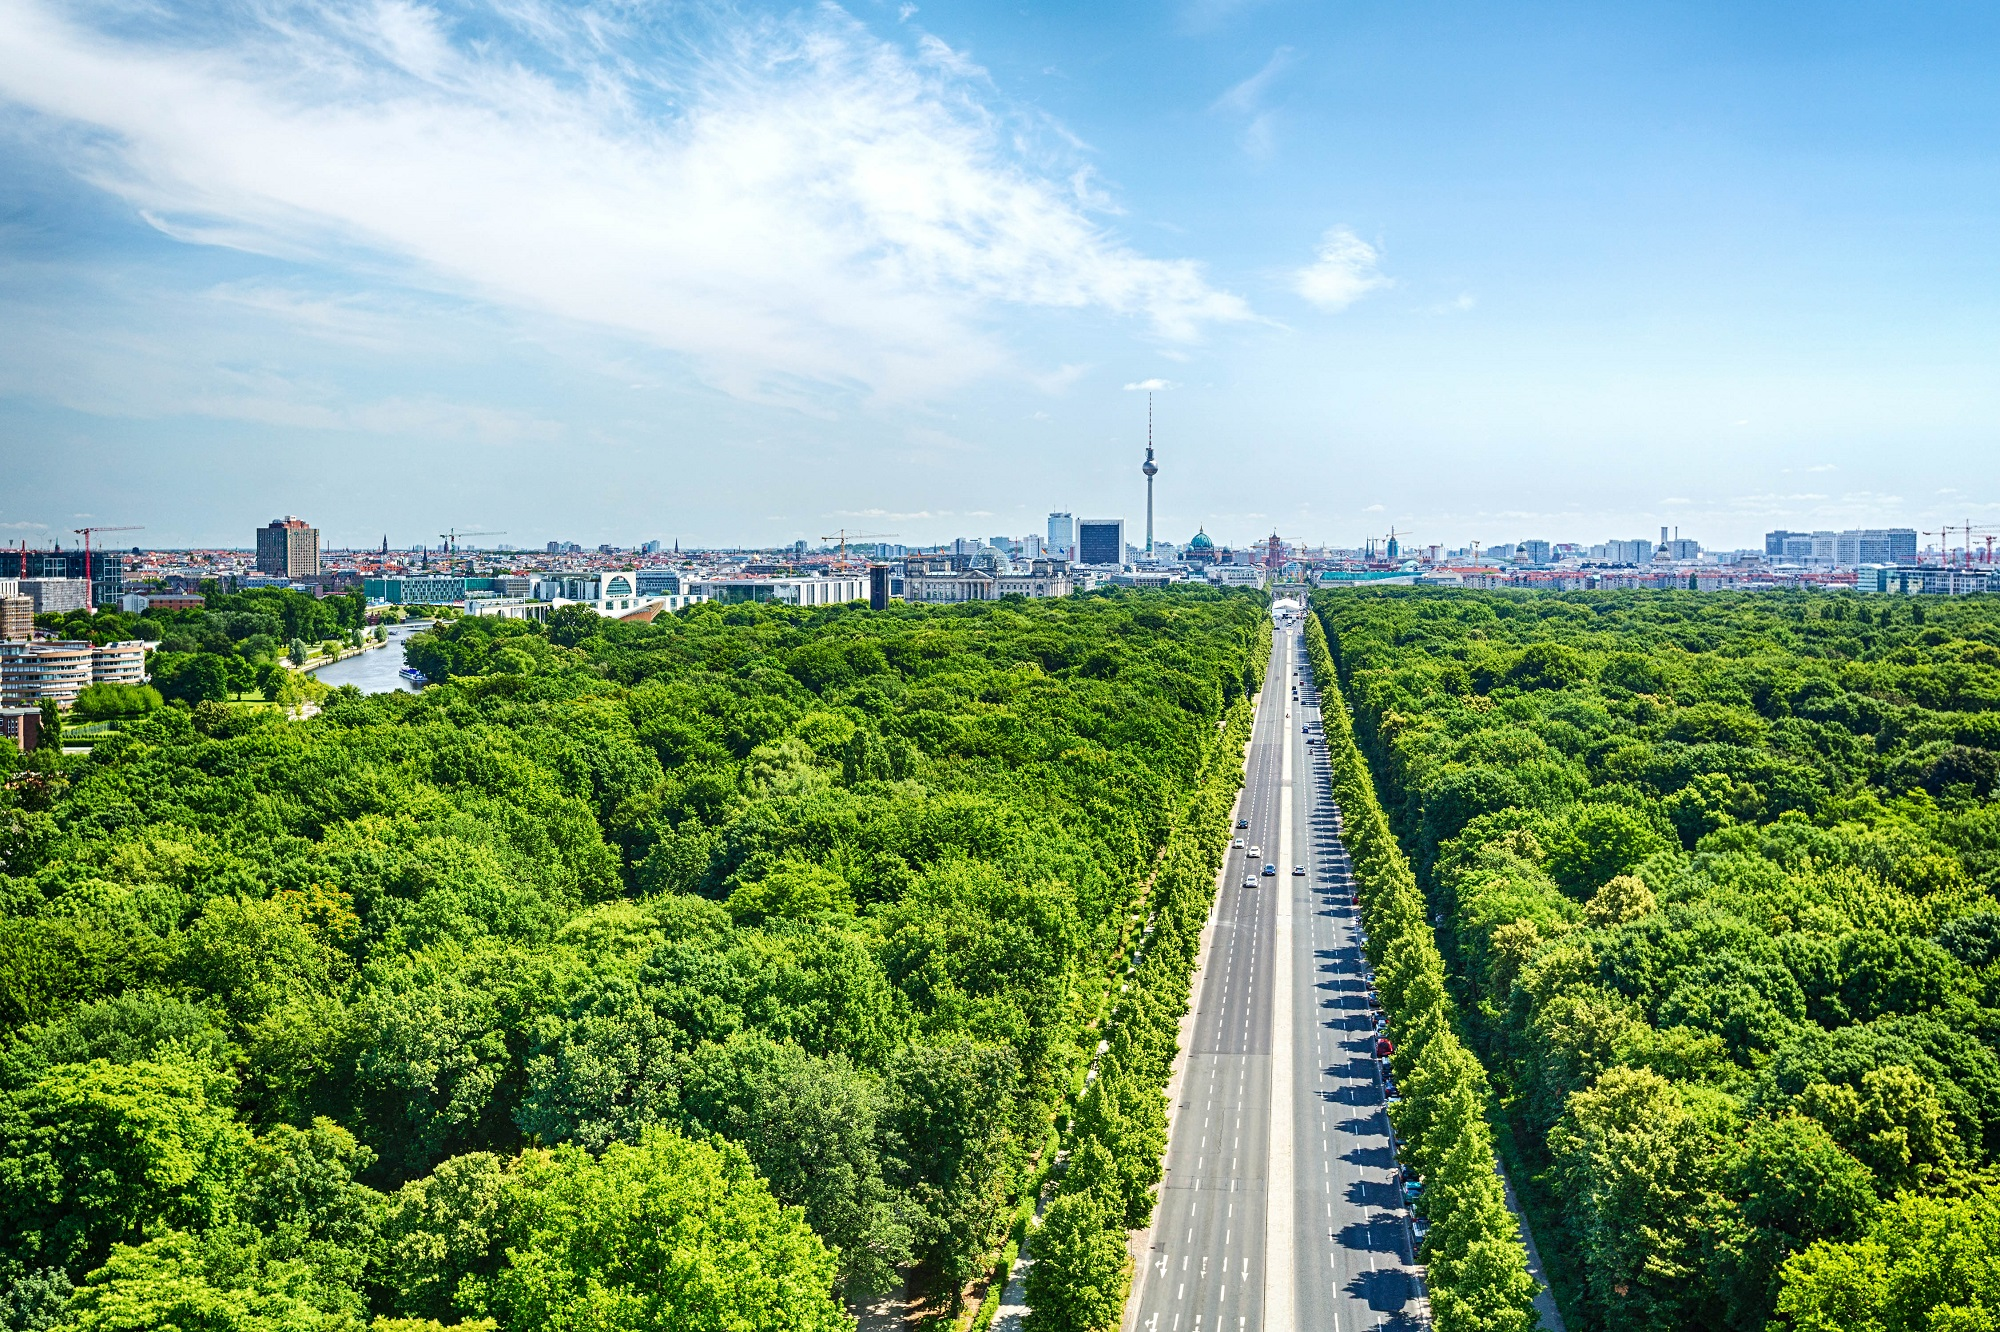 vegan reisen berlin